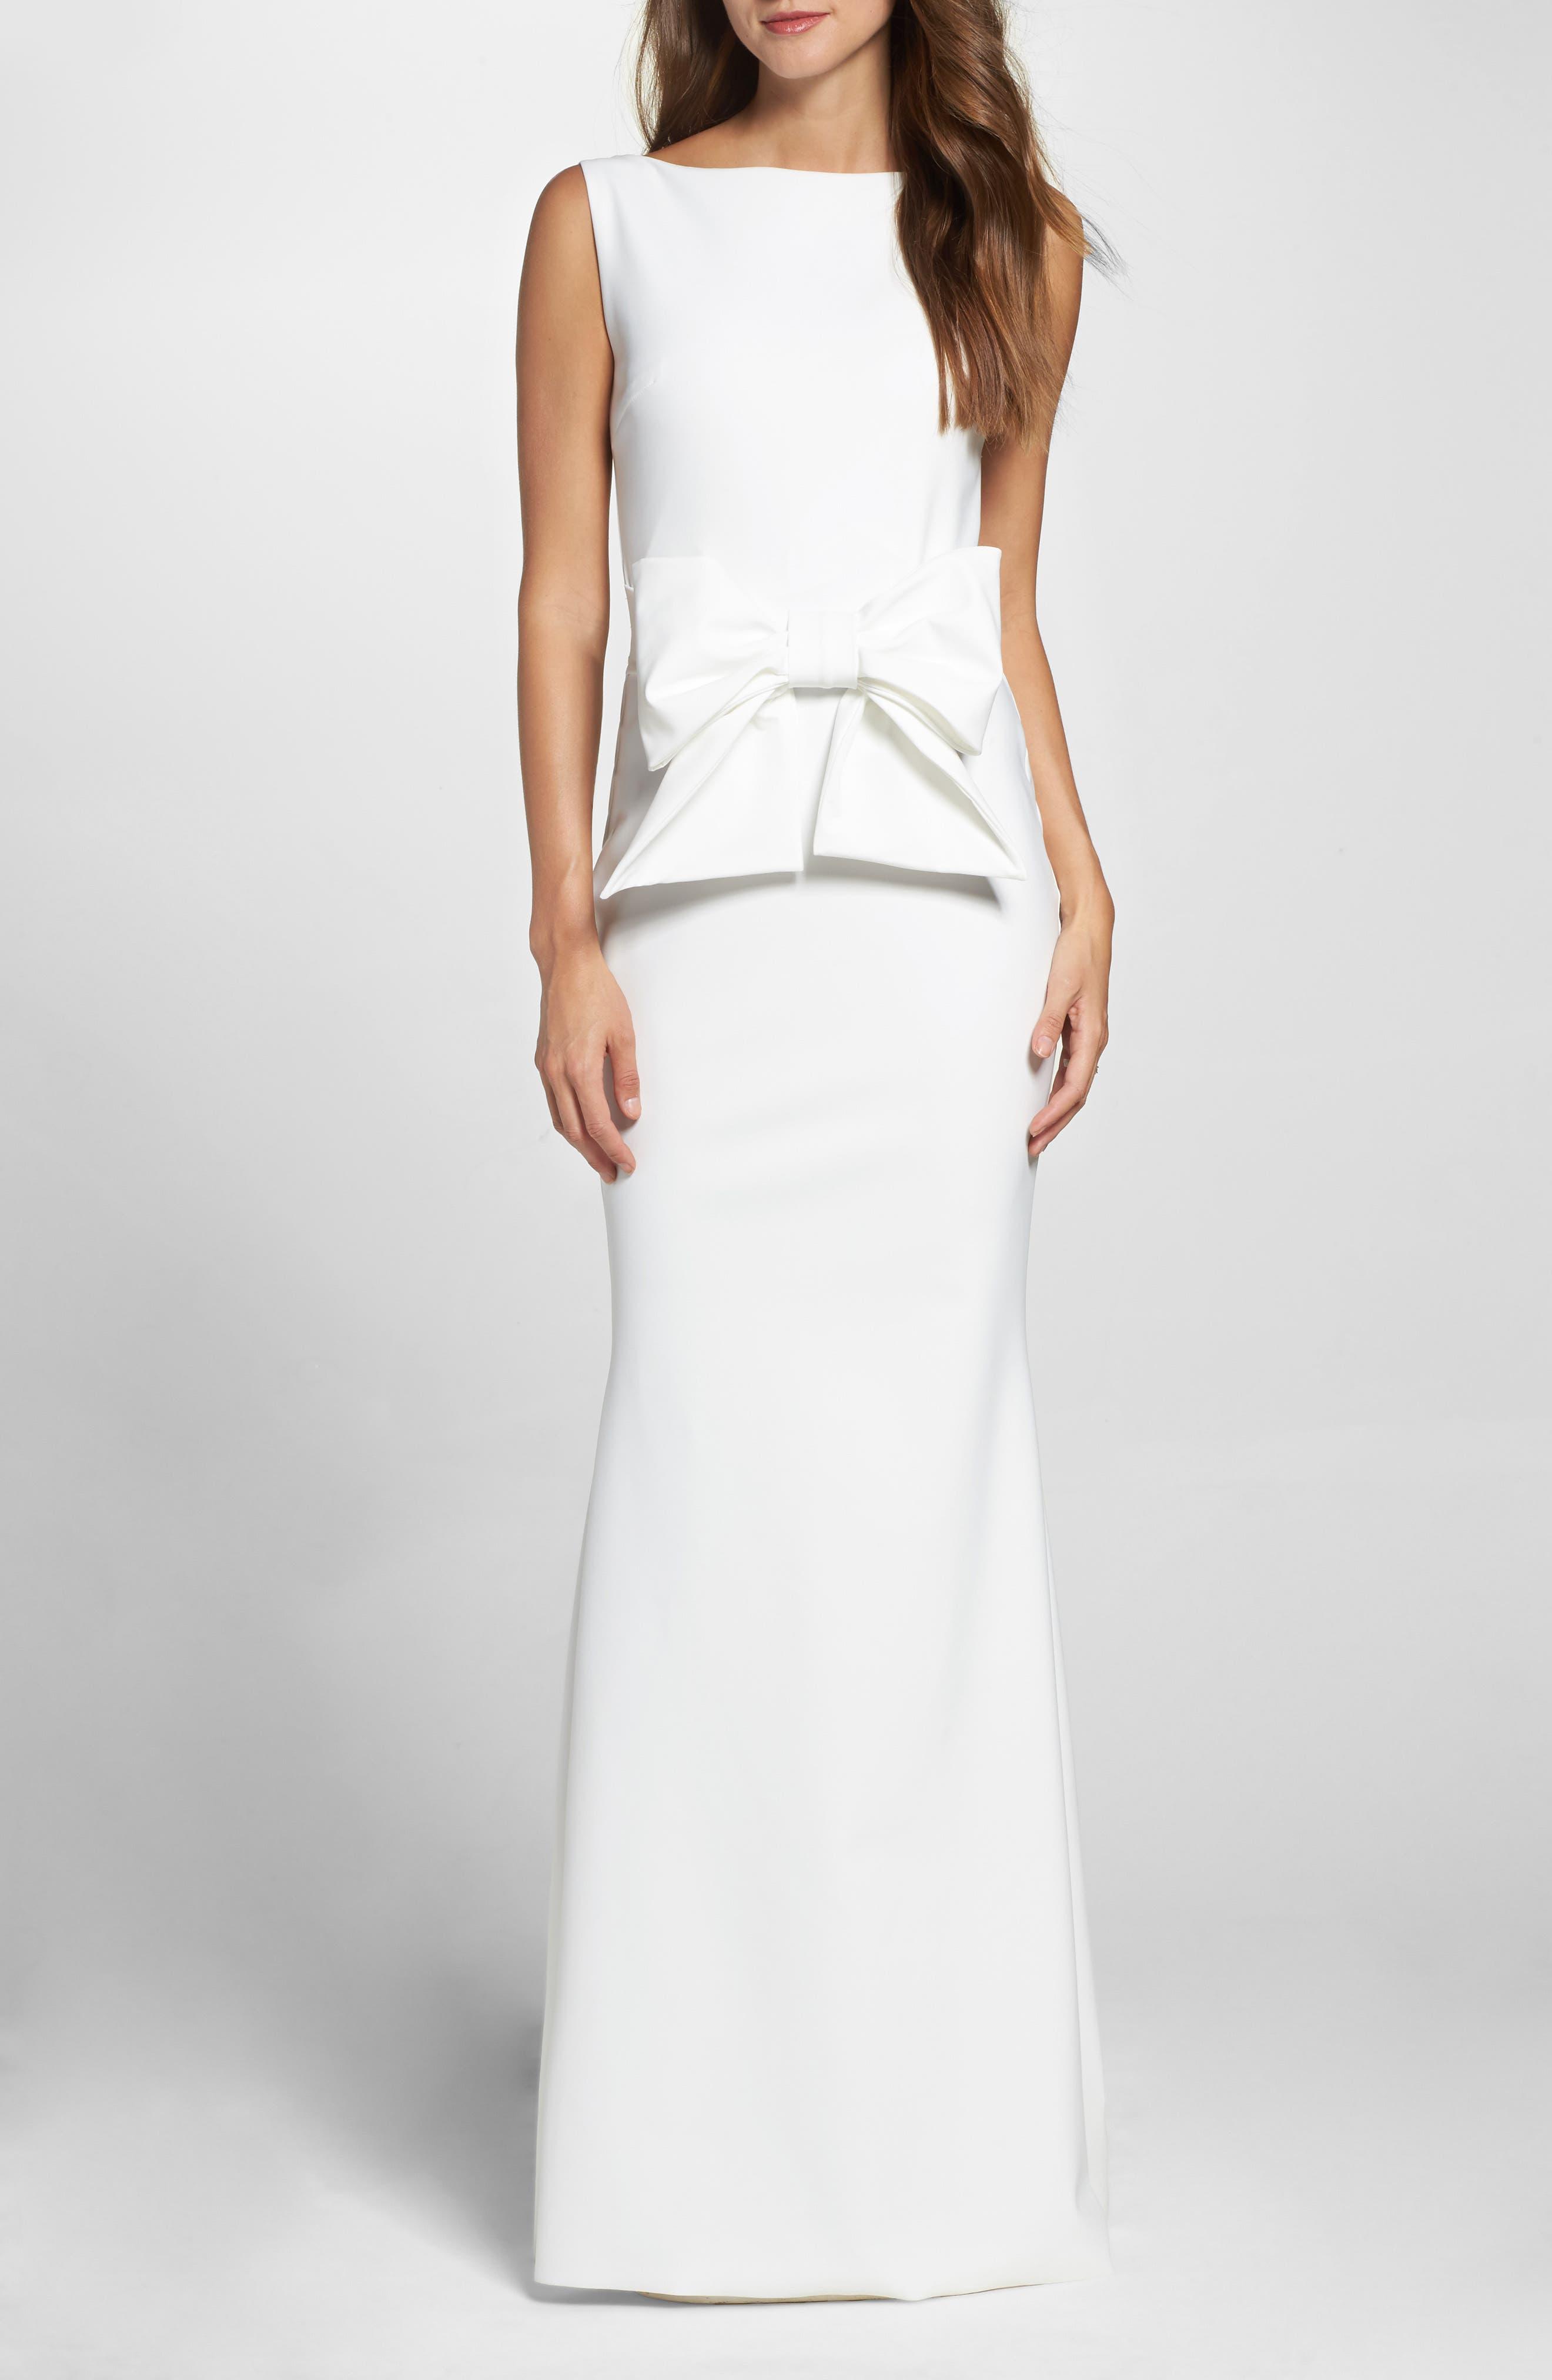 CHIARA BONI LA PETITE ROBE Bow Detail Sleeveless Gown, Main, color, 100